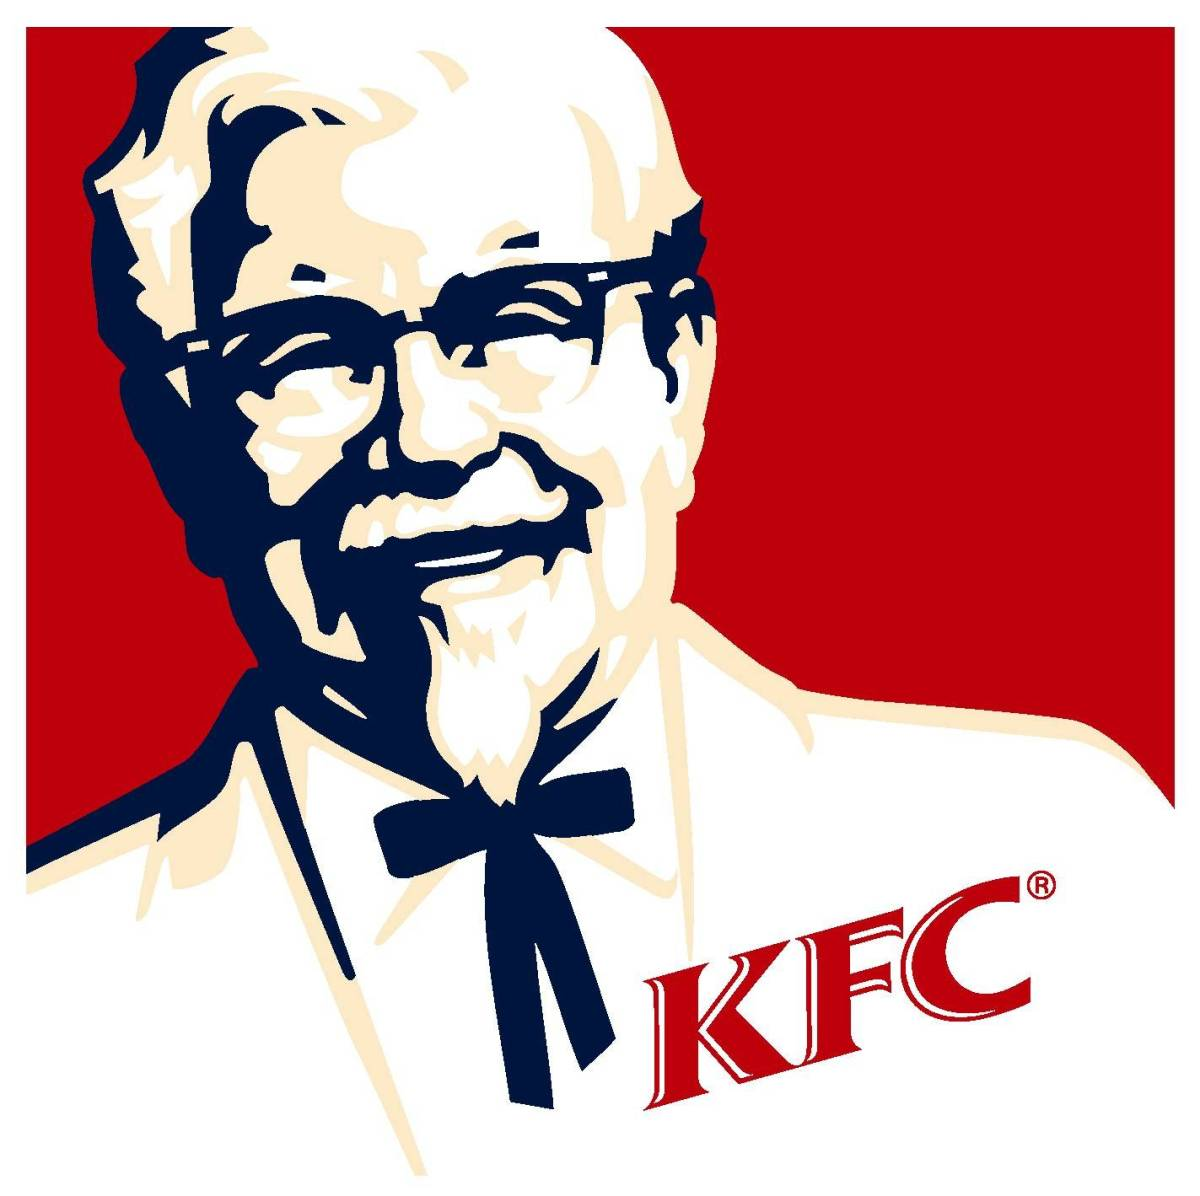 Colonel Sanders - The symbol of KFC